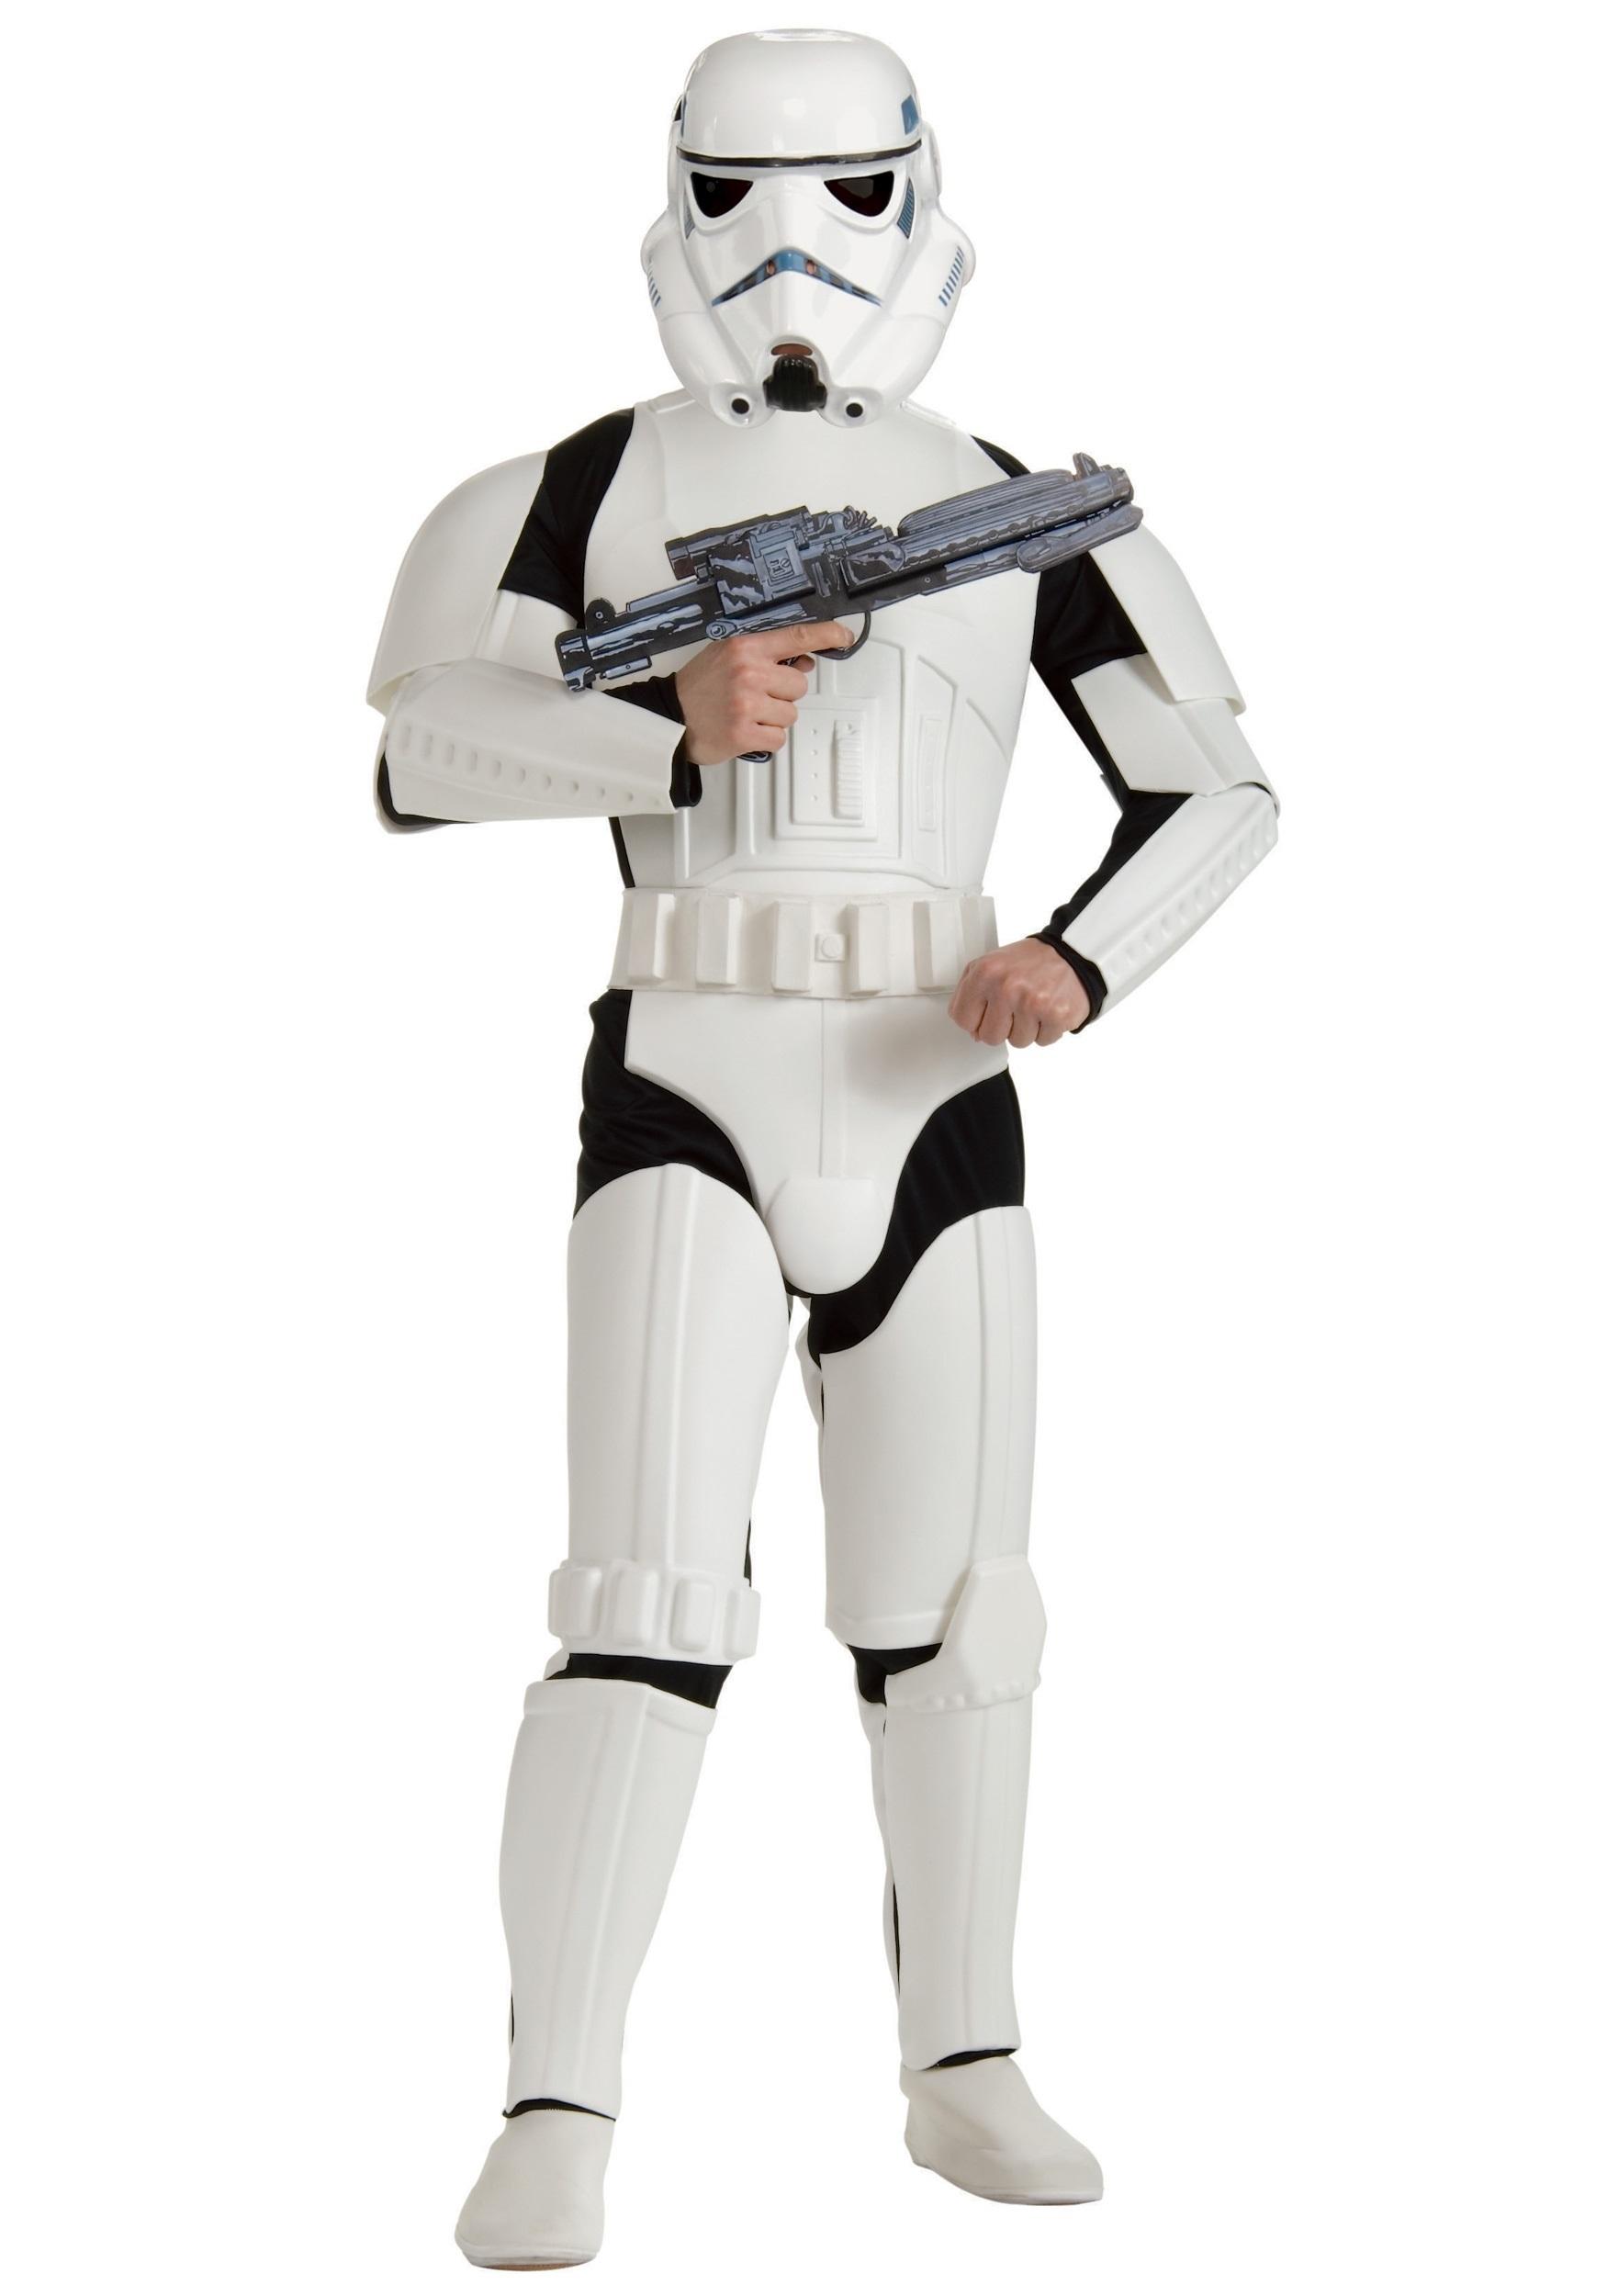 Adult Deluxe Plus Size Stormtrooper Costume  sc 1 st  Halloween Costumes & Adult Deluxe Plus Size Stormtrooper Costume 2X